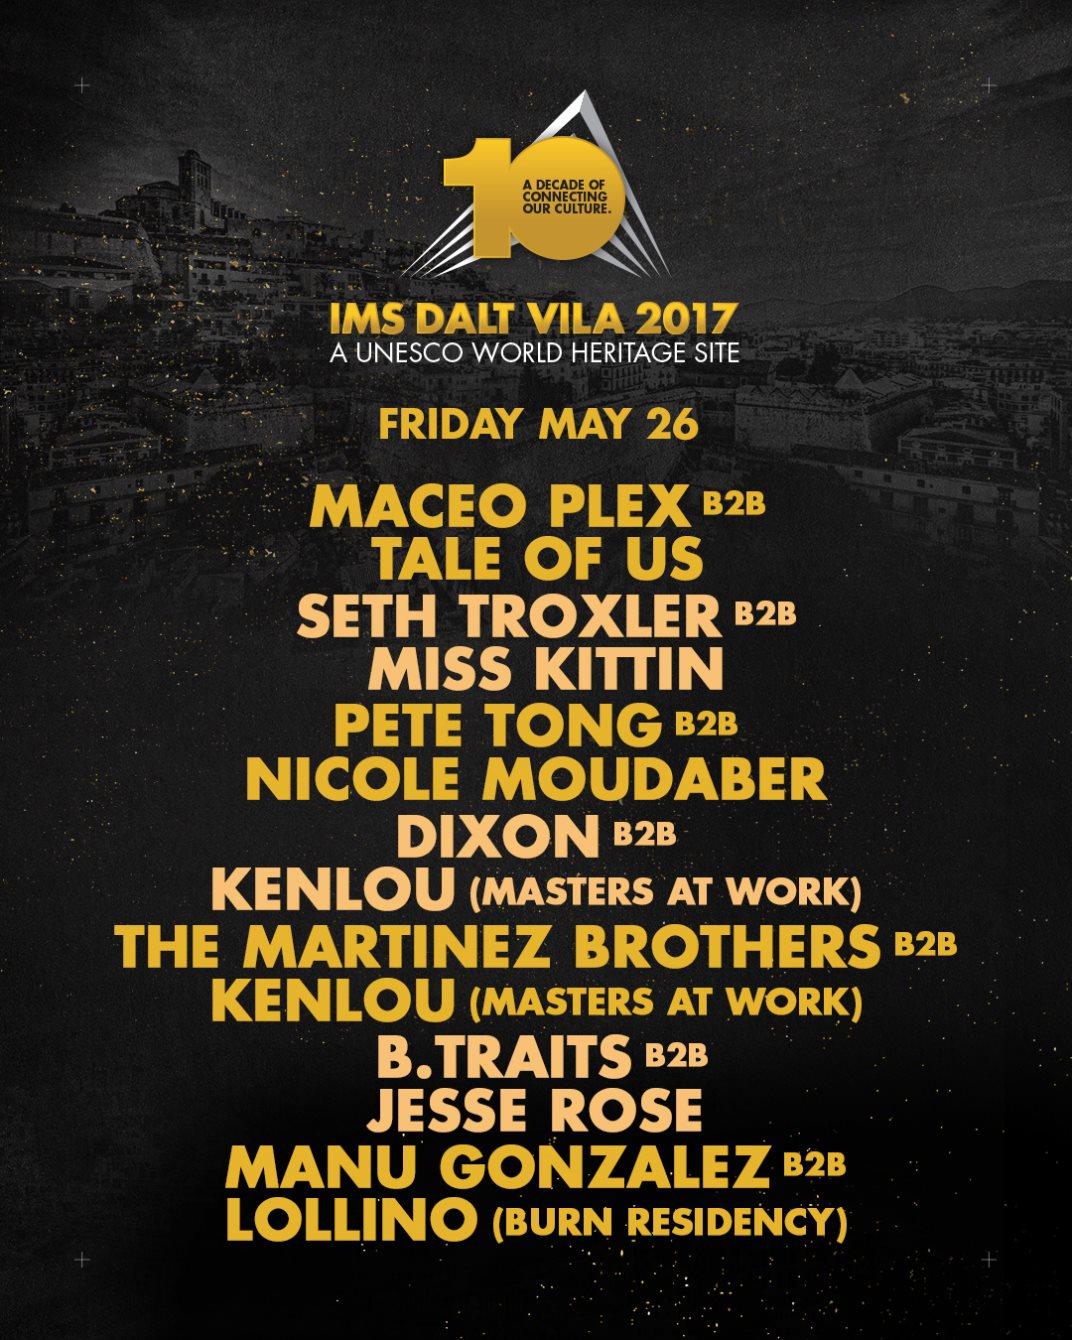 IMS Dalt Vila 2017 - Flyer front